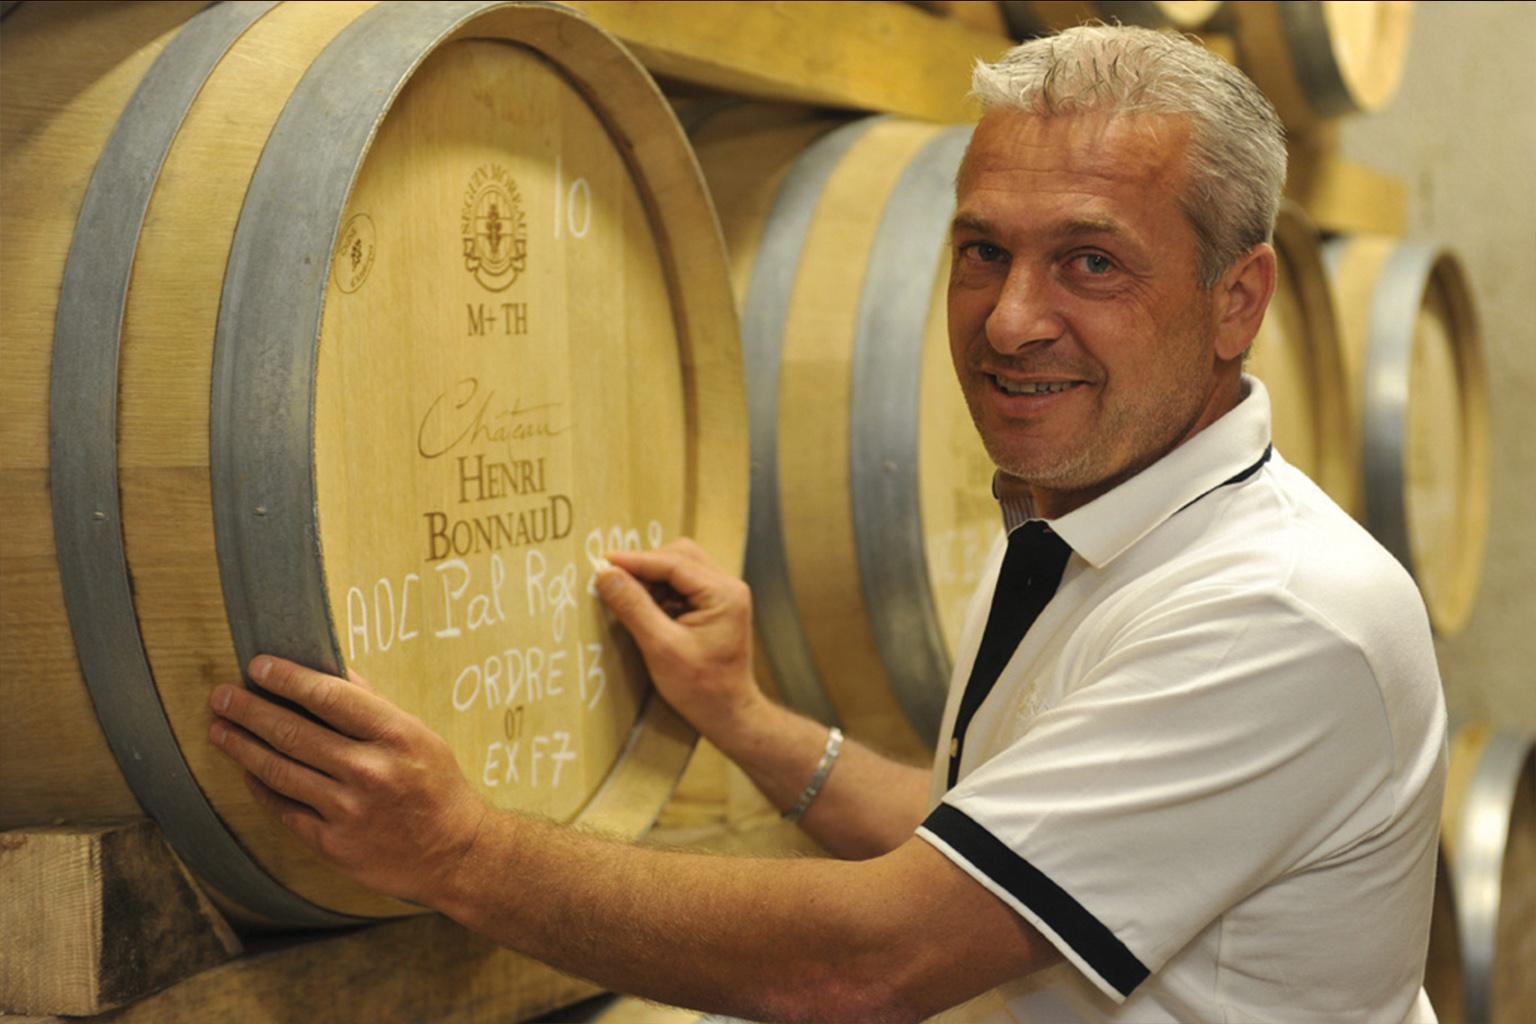 Château Henri Bonnaud - アペロ ワインバー オーガニックワインxフランス家庭料理 - 東京都港区南青山3-4-6 / apéro WINEBAR - vins et petits plats français